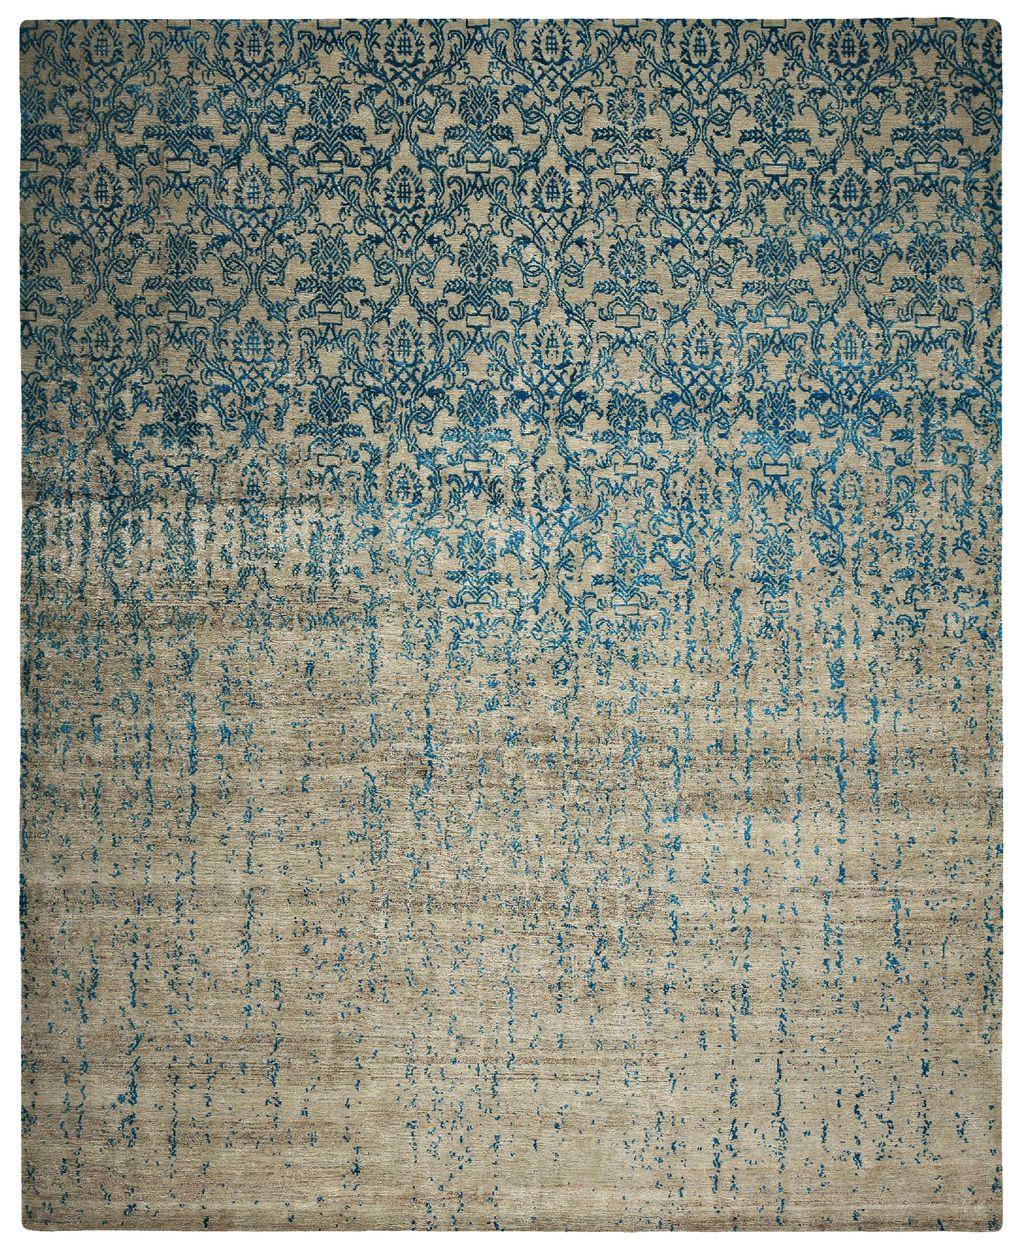 modnye risunki na kovrah patterns carpet design and